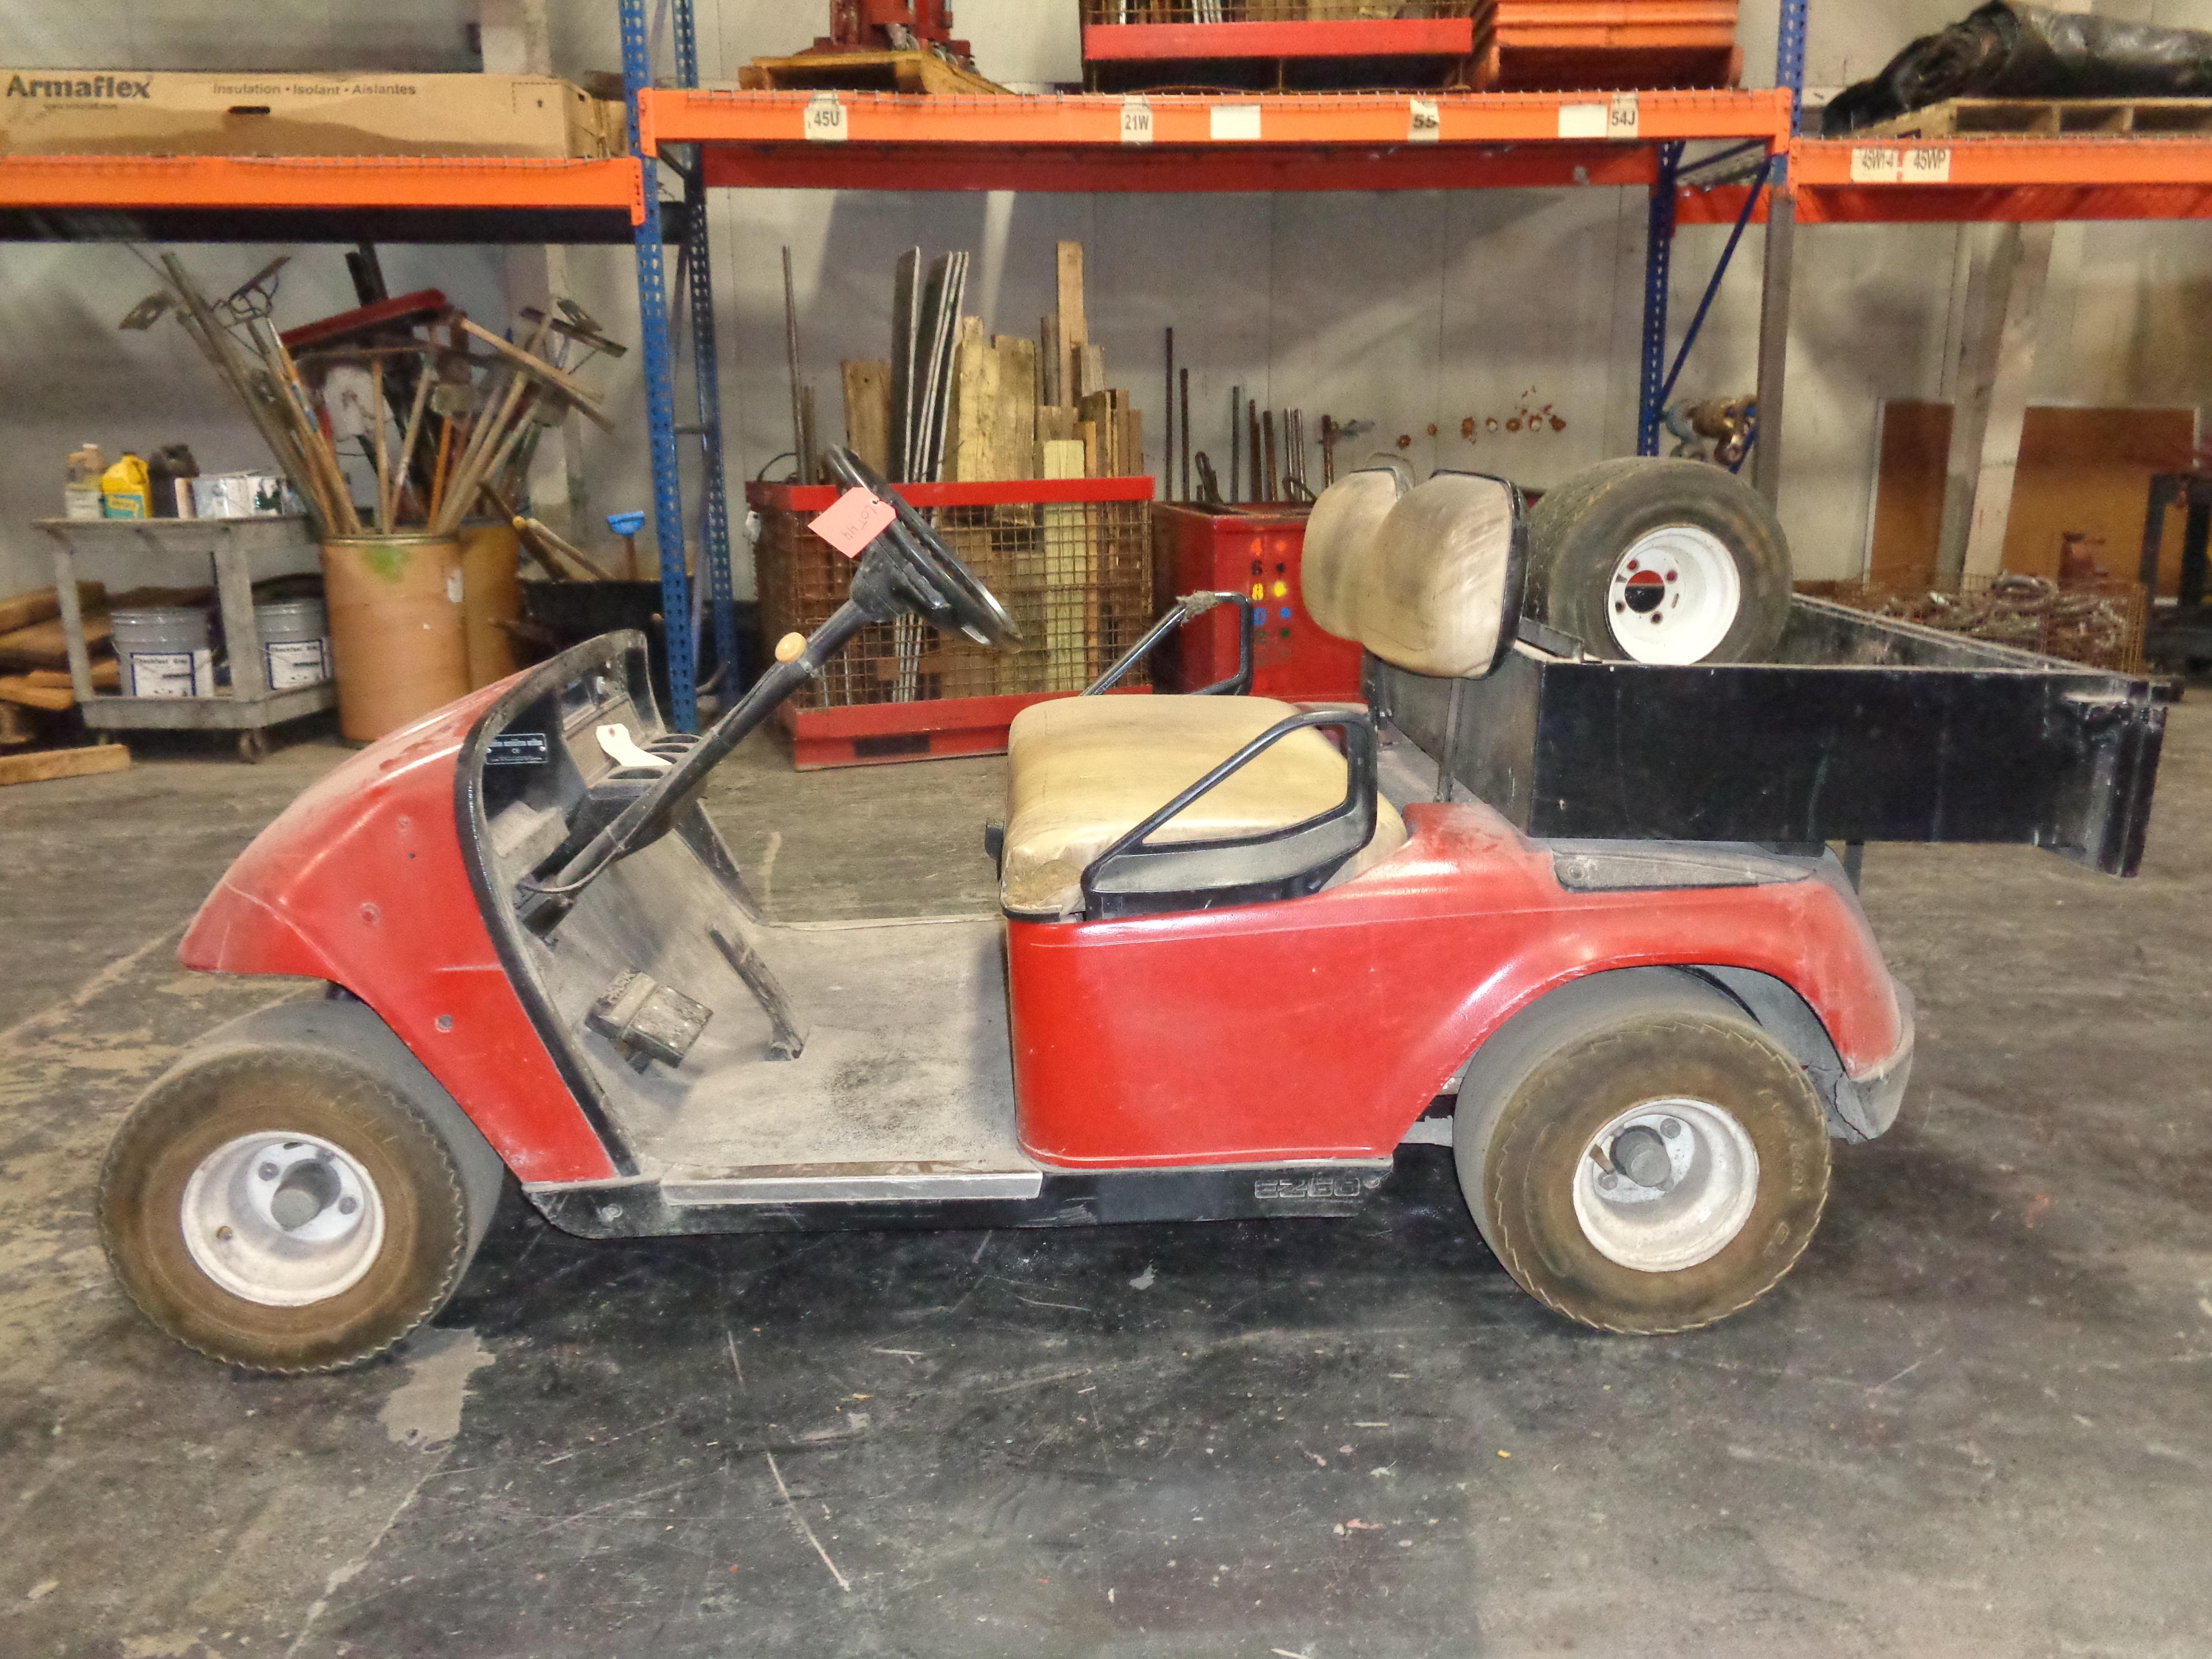 1996 EZGO Golf Cart - Image 4 of 4